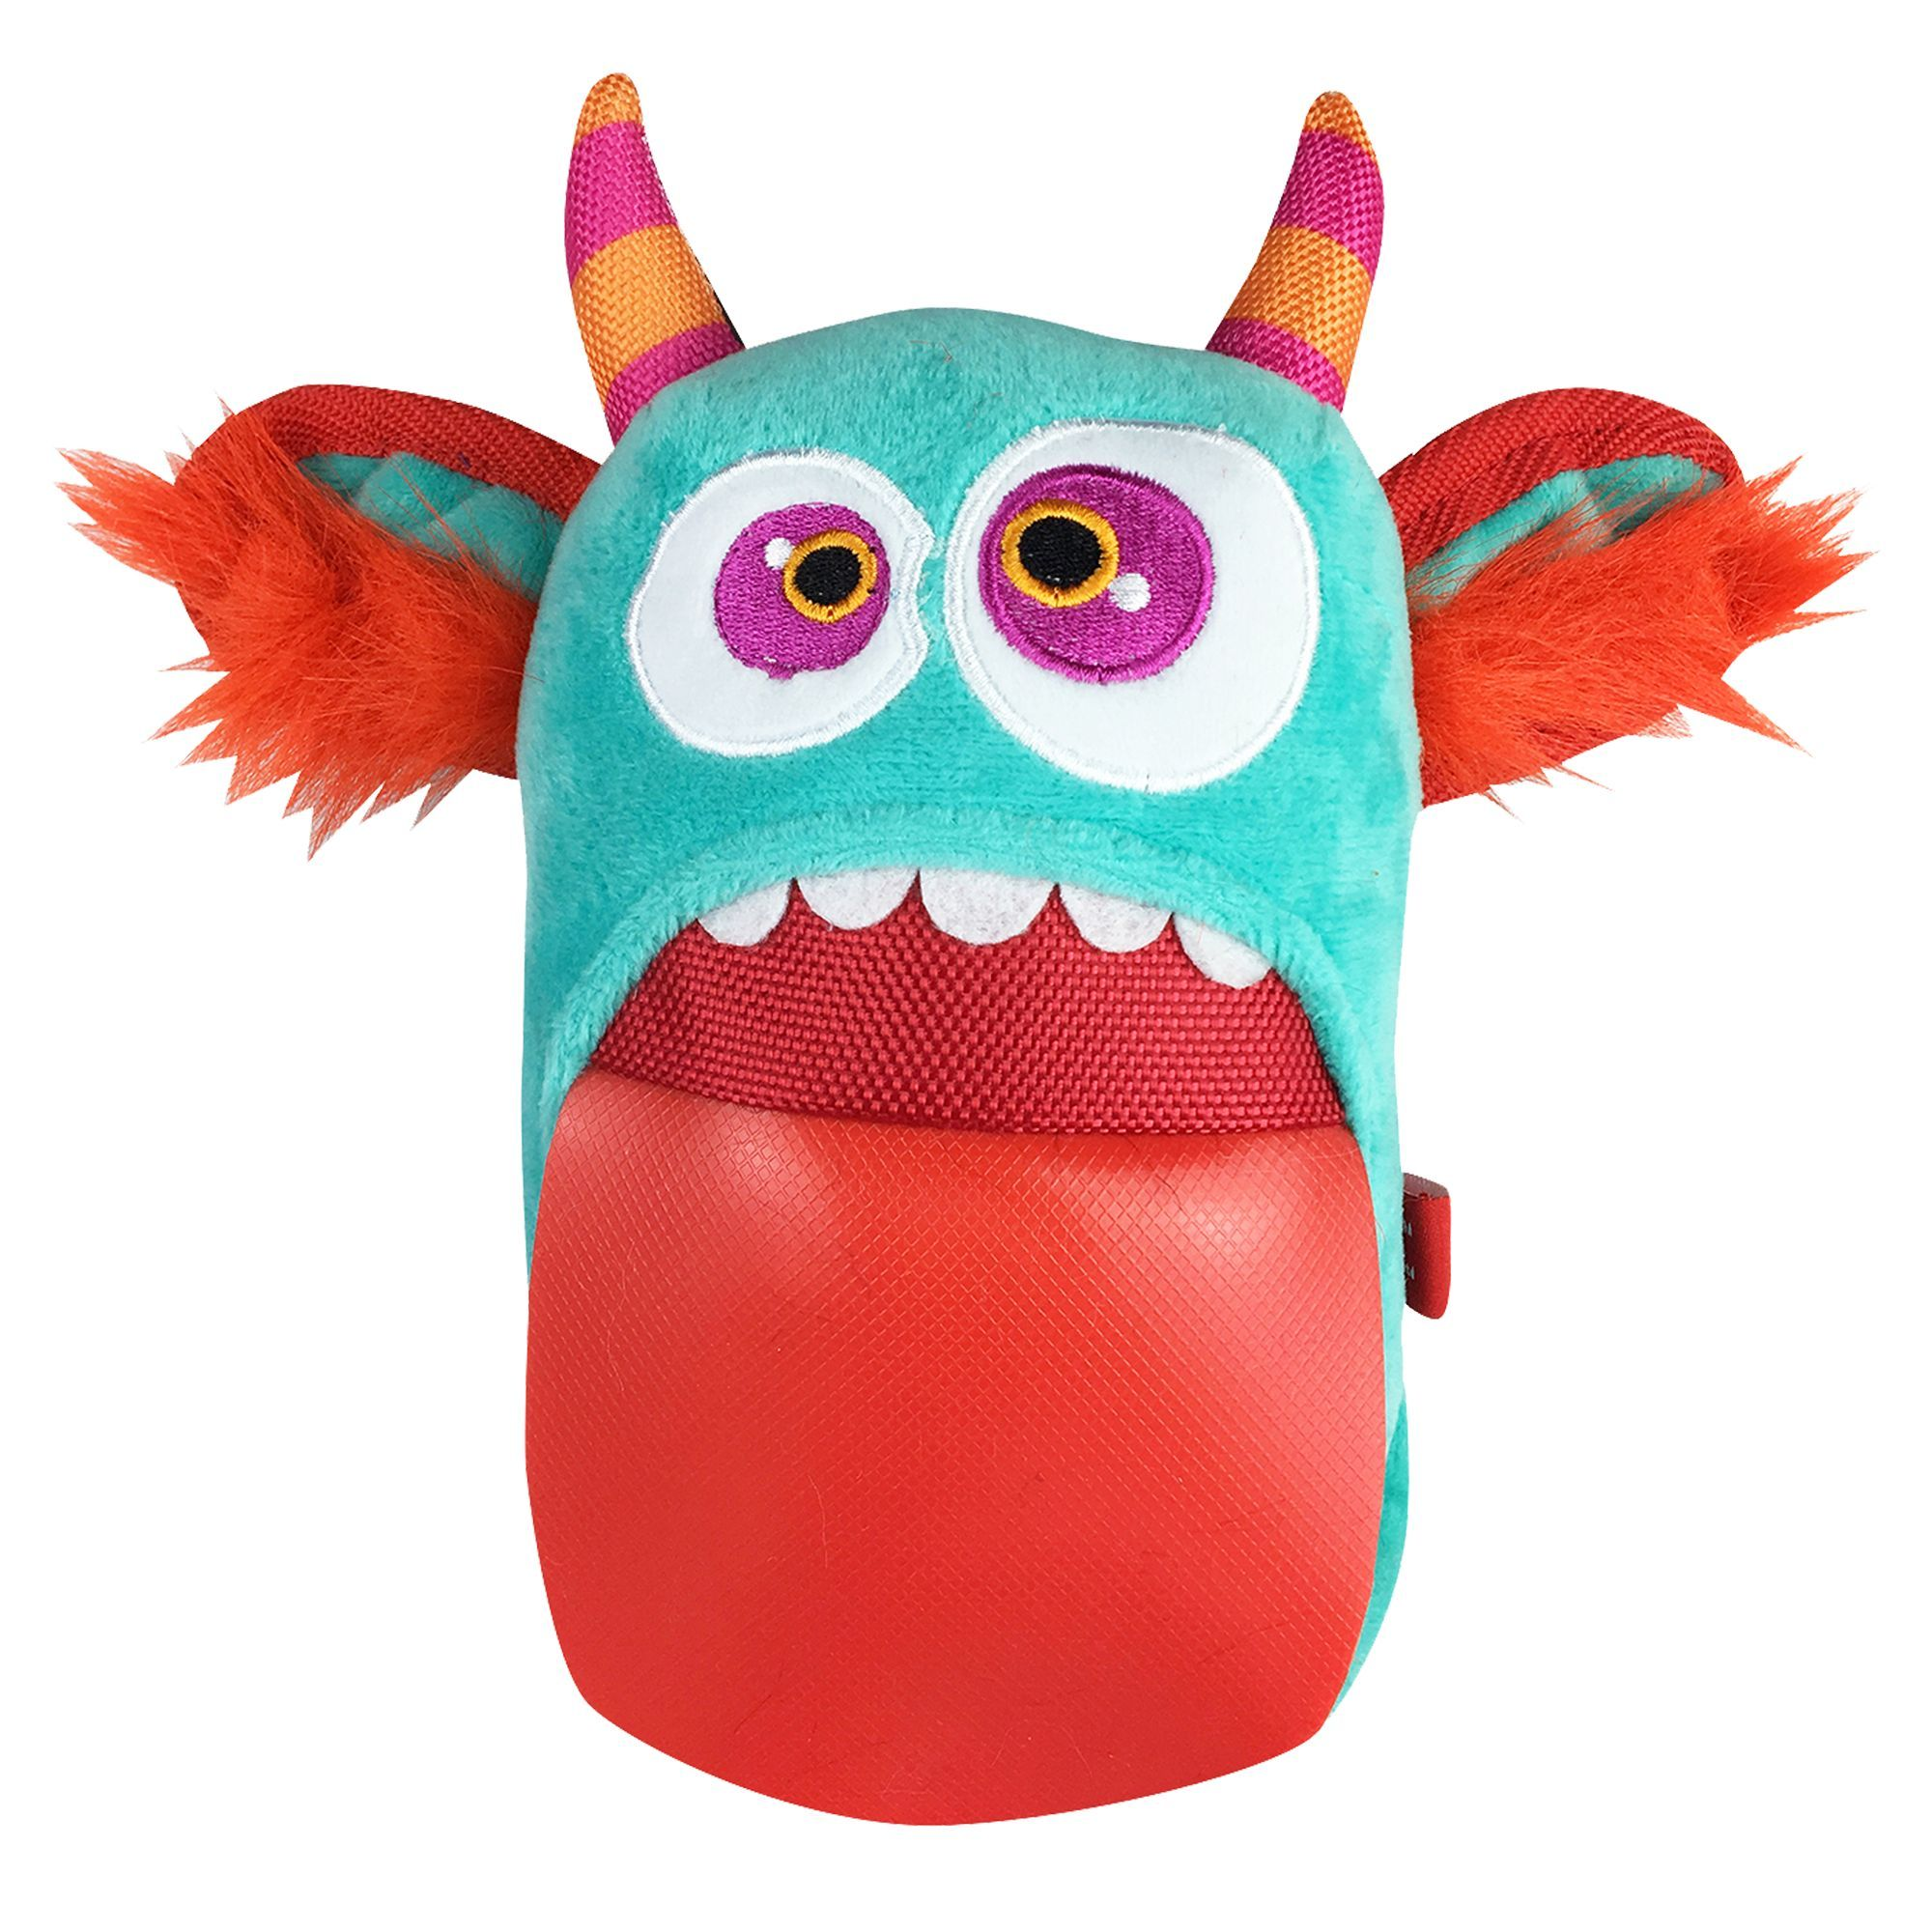 Mega Plush Tongue Monster Dog Toy Squeaker Treat Dispensing